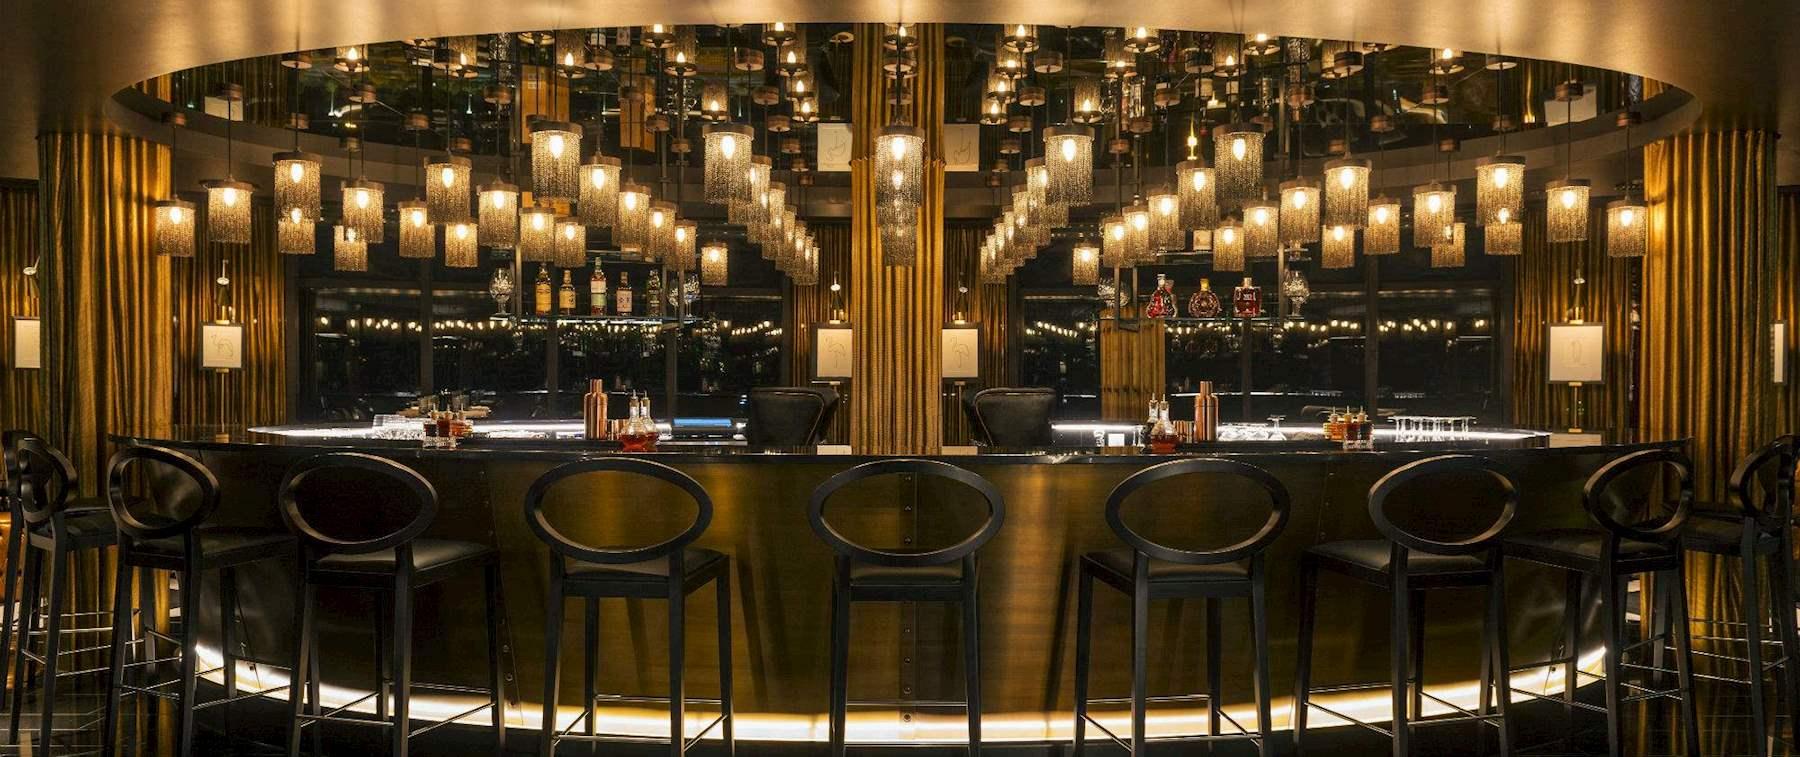 Stratos Revolving Lounge Bar & Grill